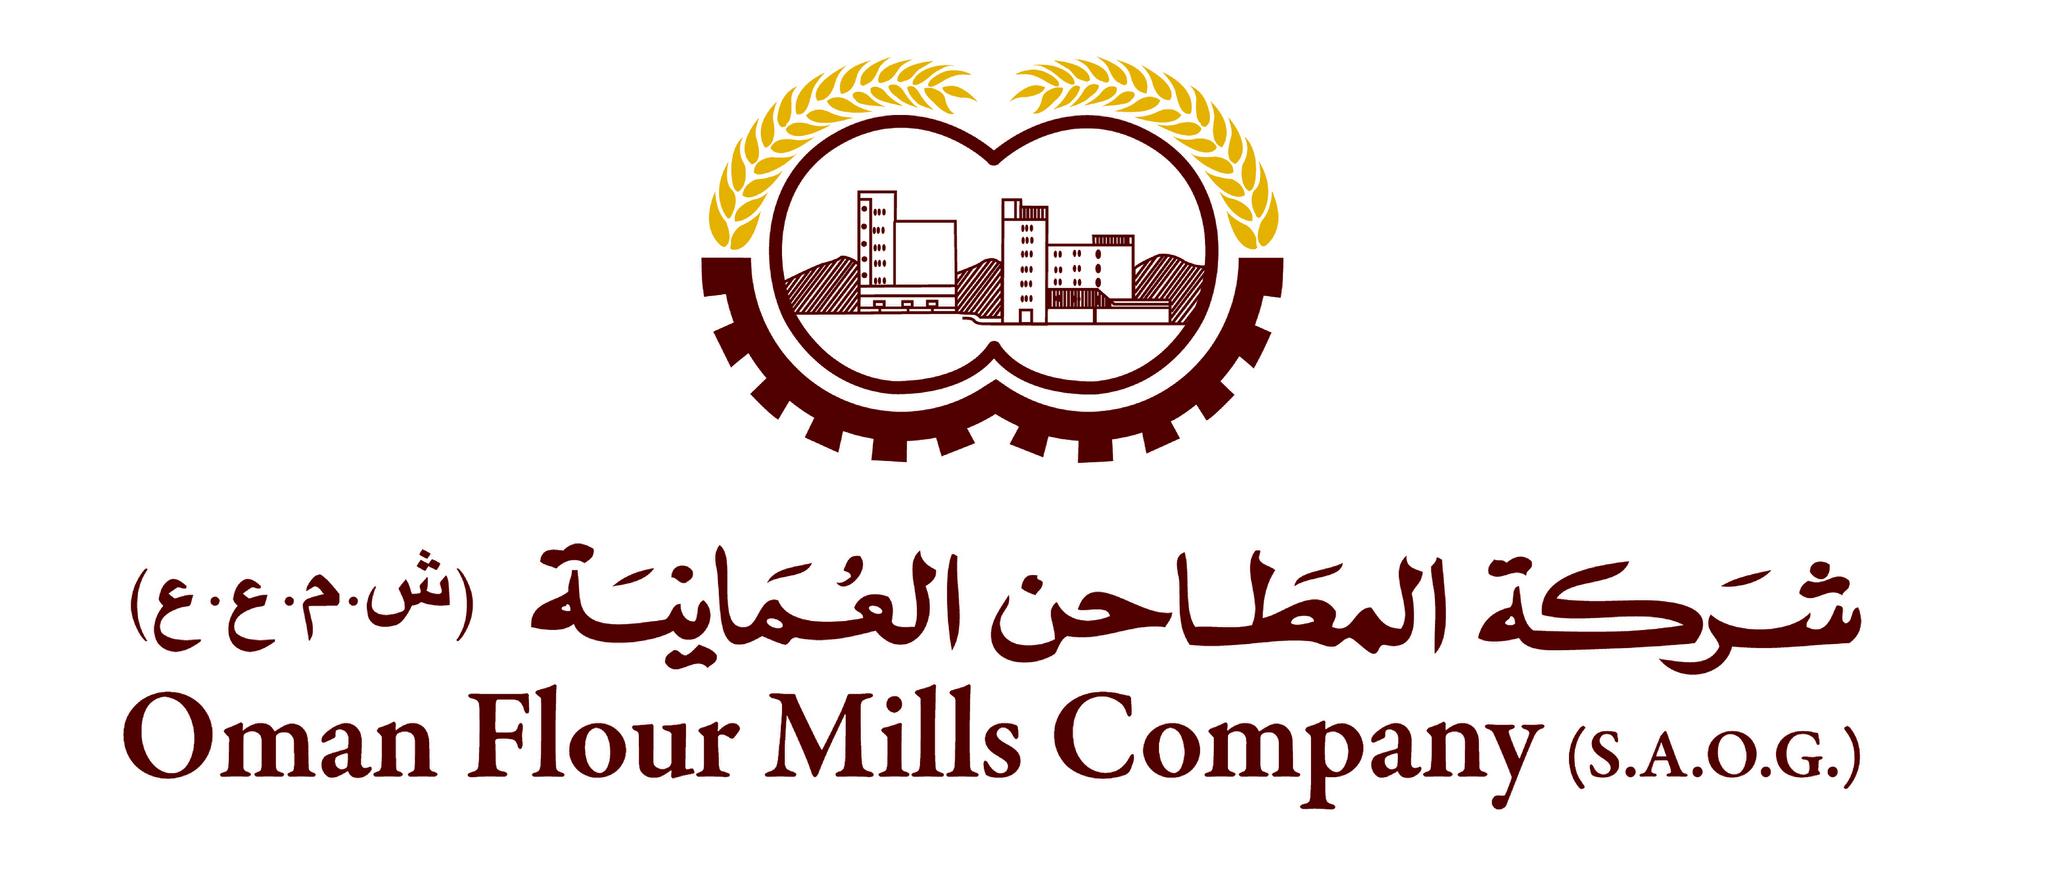 Oman Flour Mills - Gulfood 2019 - World's largest annual food